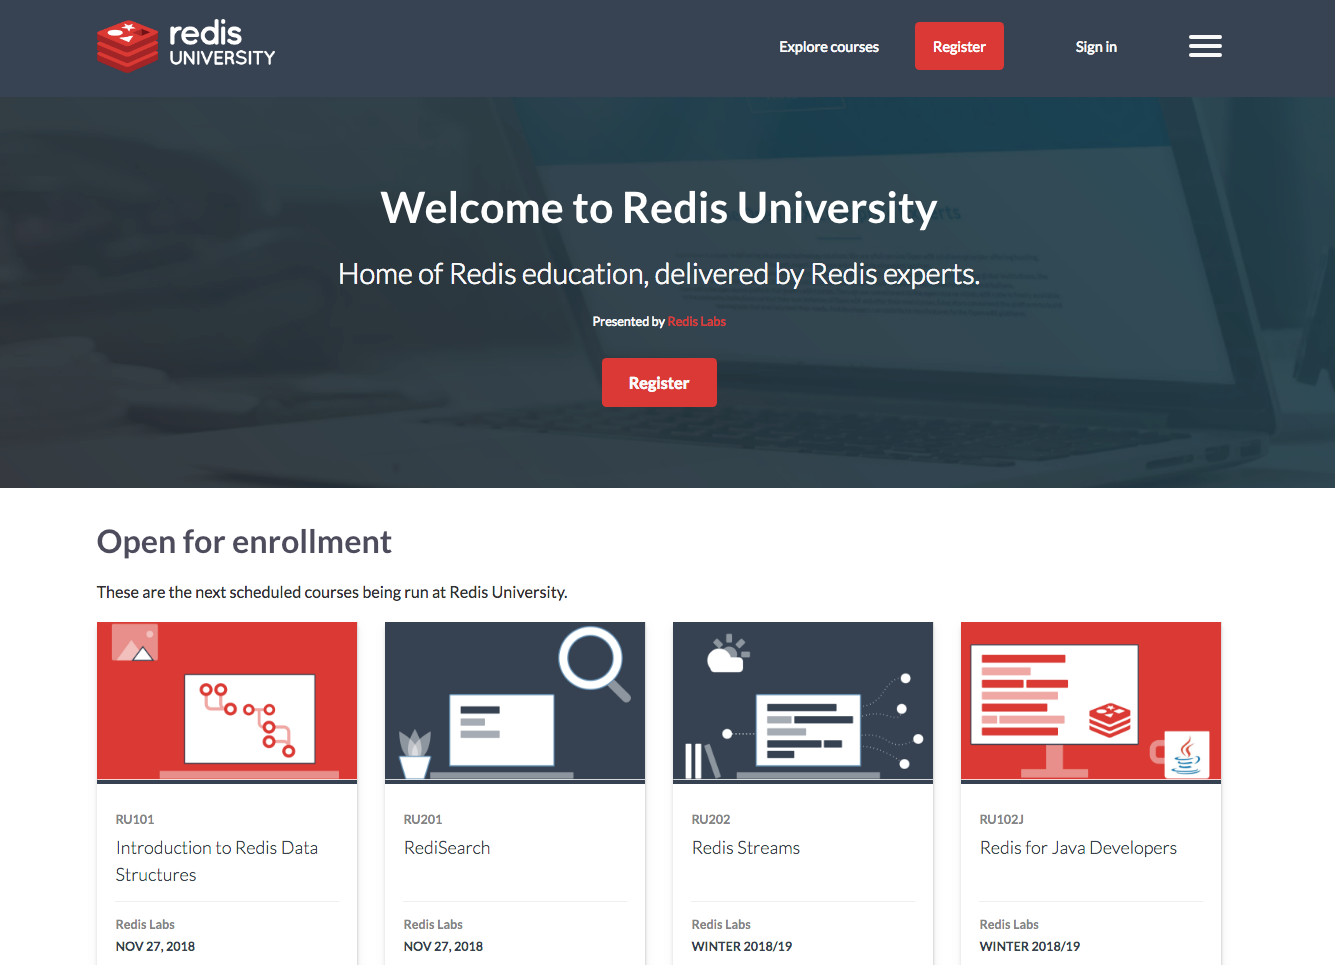 redisU online software learning